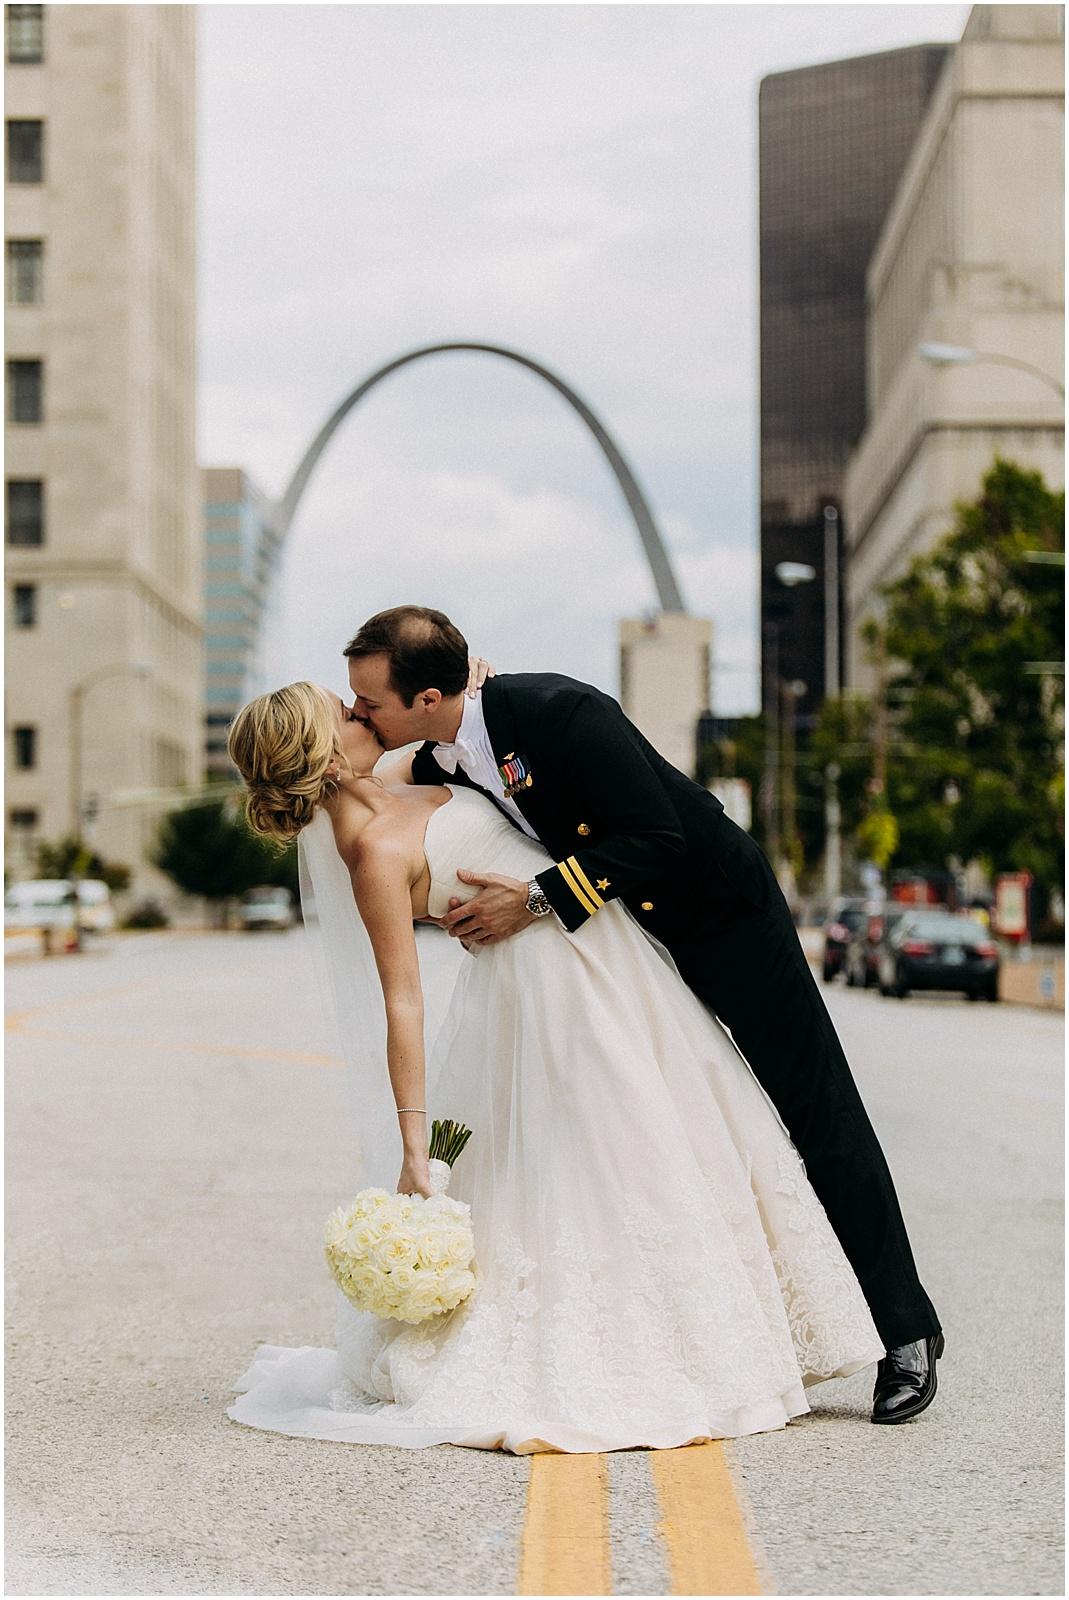 glen_echo_st_louis_mo_wedding_0062.jpg